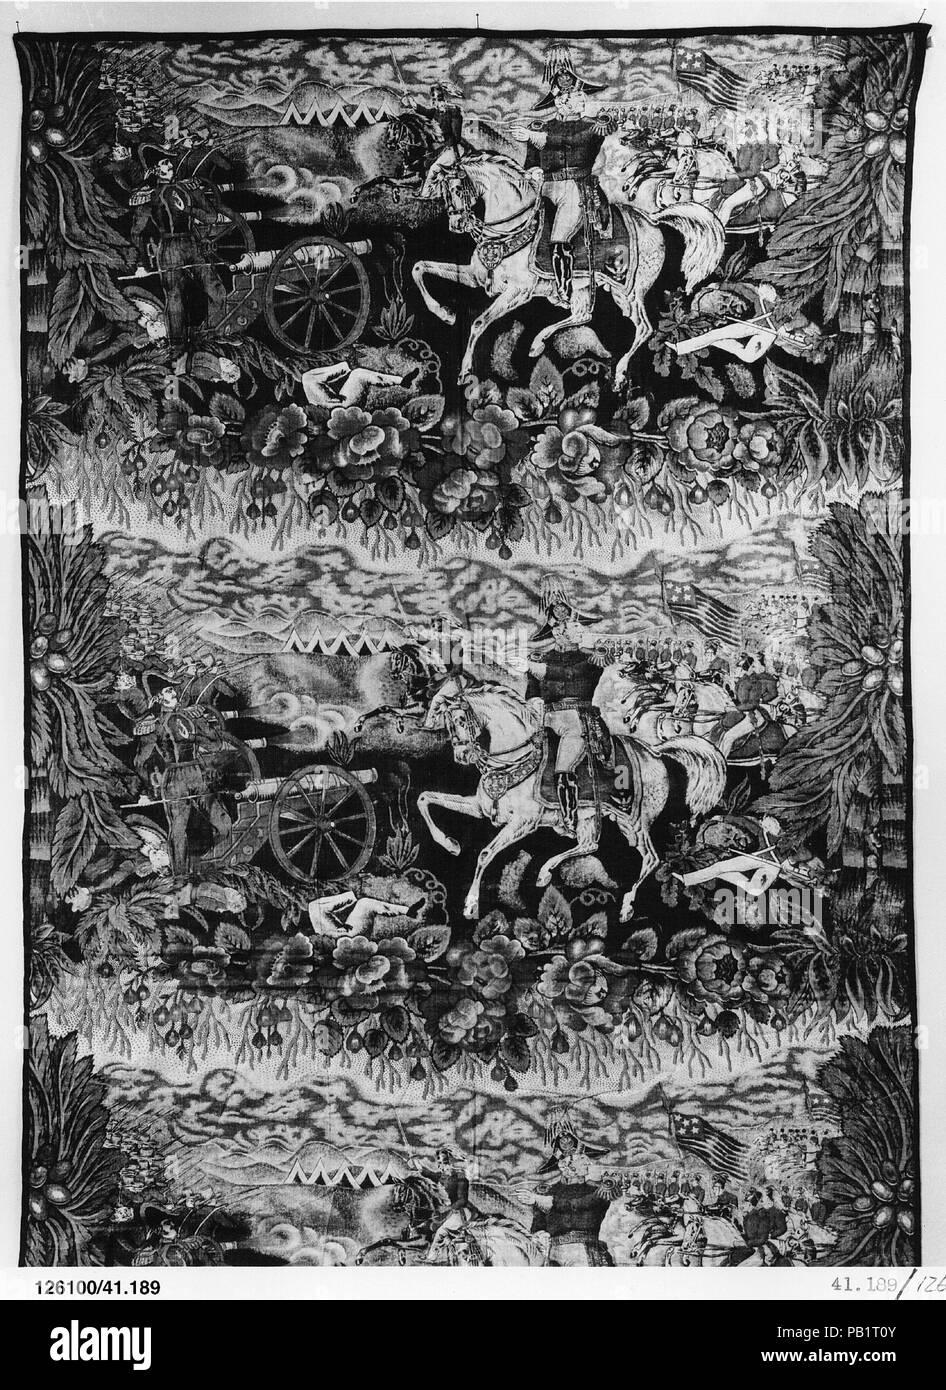 Piece. Culture: American. Dimensions: 52 3/4 x 24 1/4 in. (134 x 61.6 cm). Date: ca. 1846-48. Museum: Metropolitan Museum of Art, New York, USA. Stock Photo